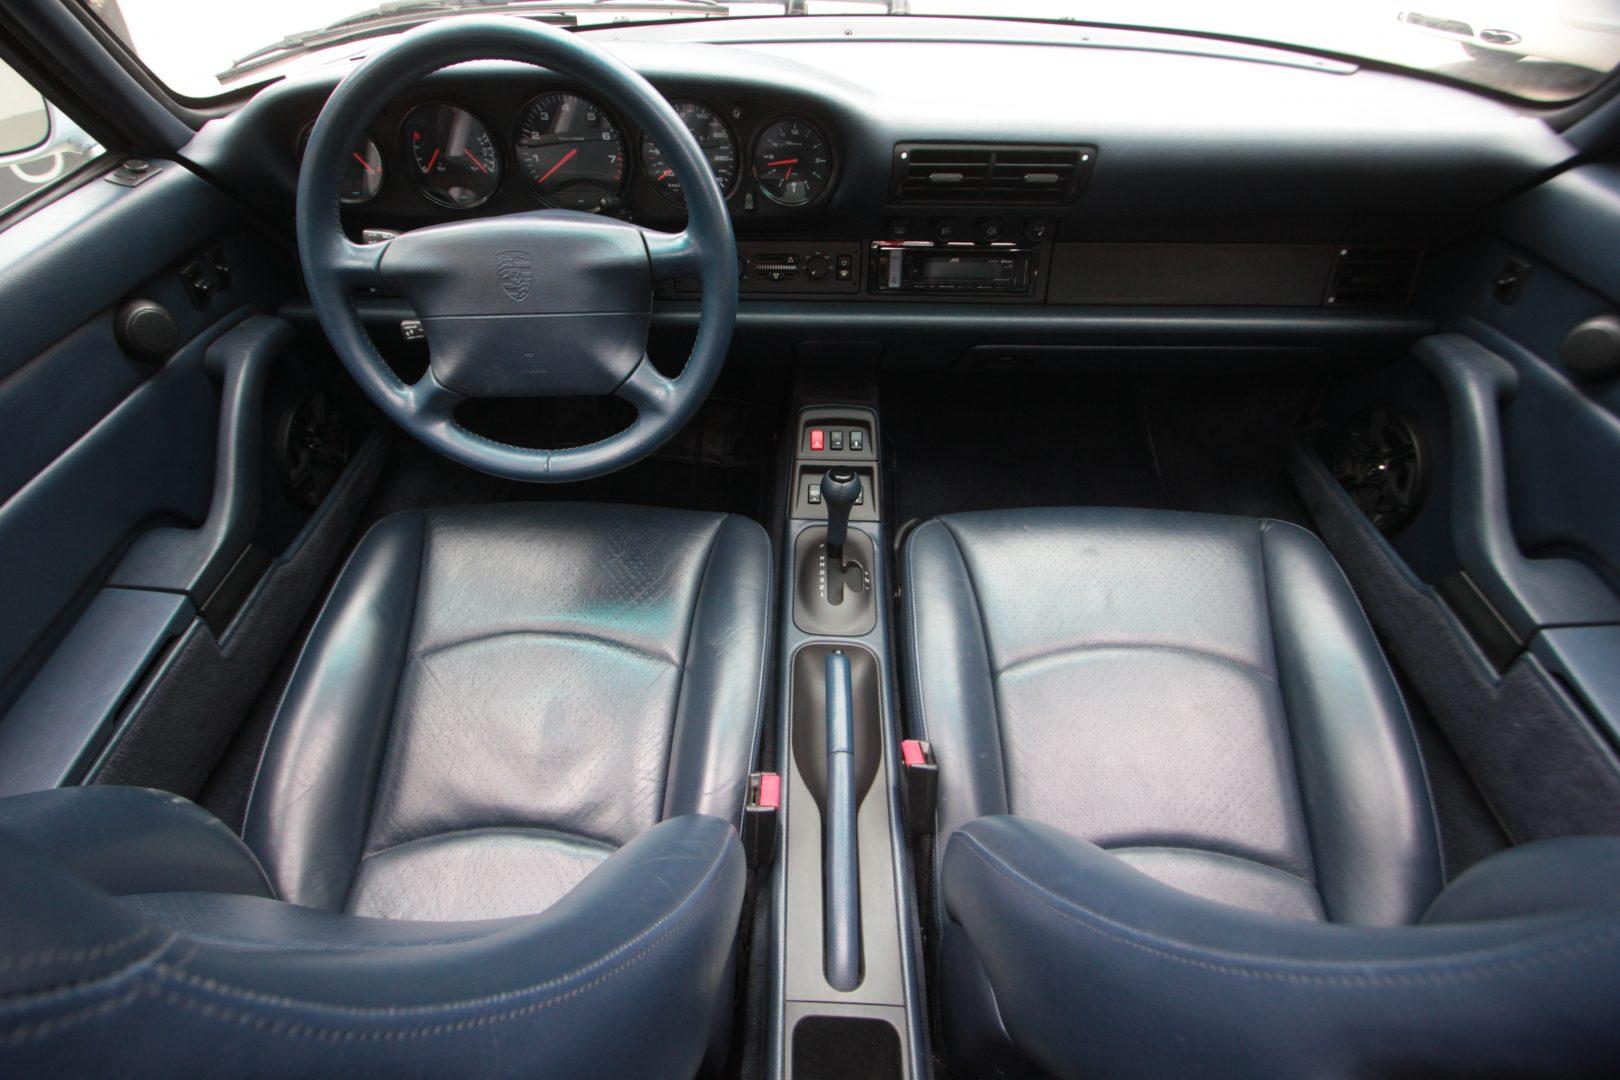 AIL Porsche 993 Carrera C2 3.6 Tiptronic 4